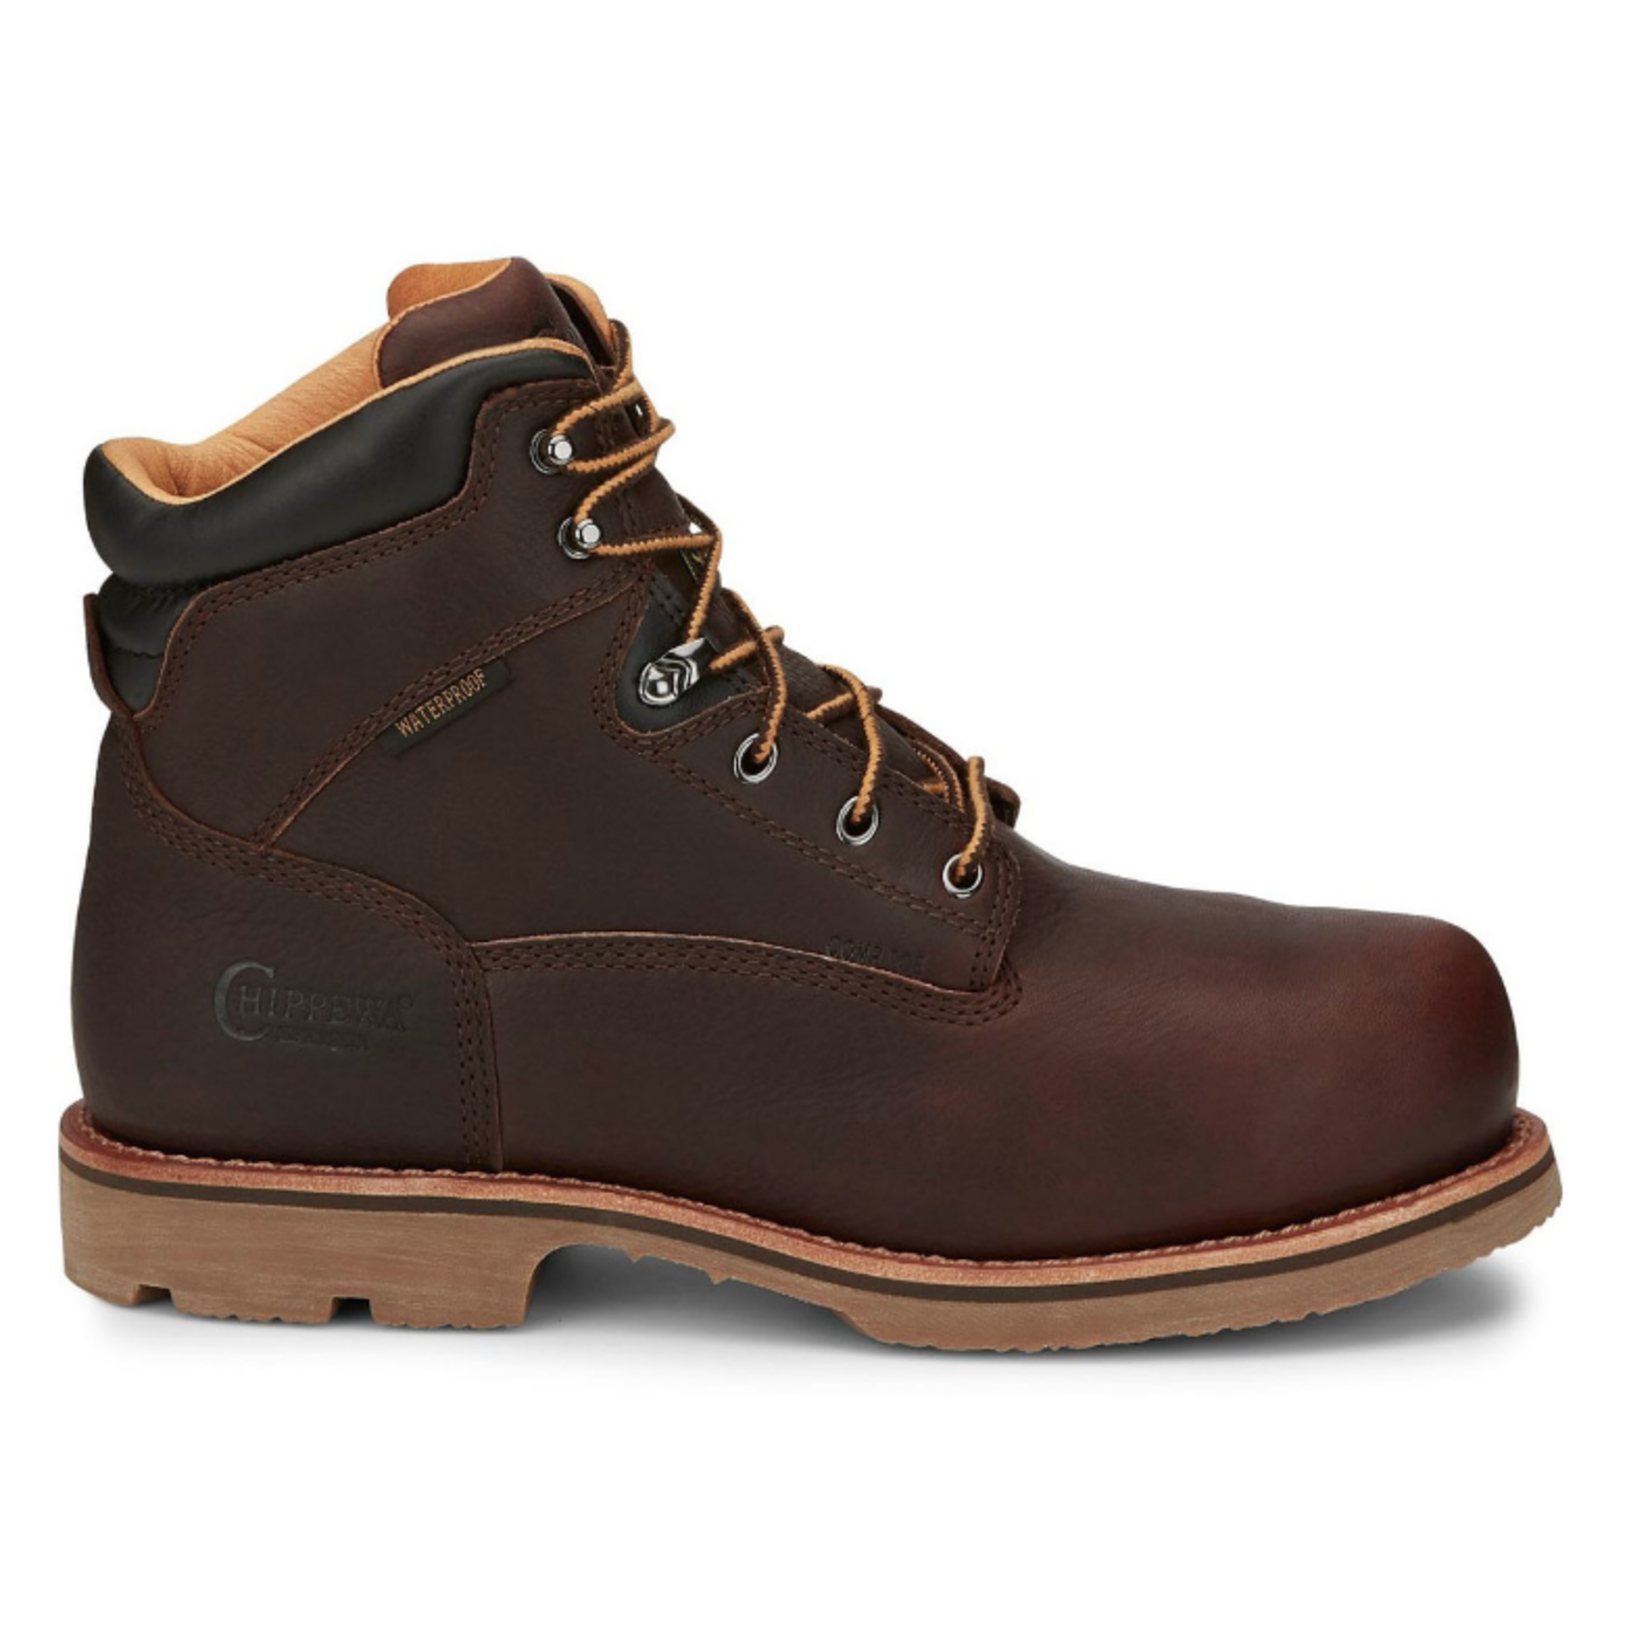 "Chippewa Men's Chippewa 6"" Composite Toe Waterproof Serious Plus 72301"